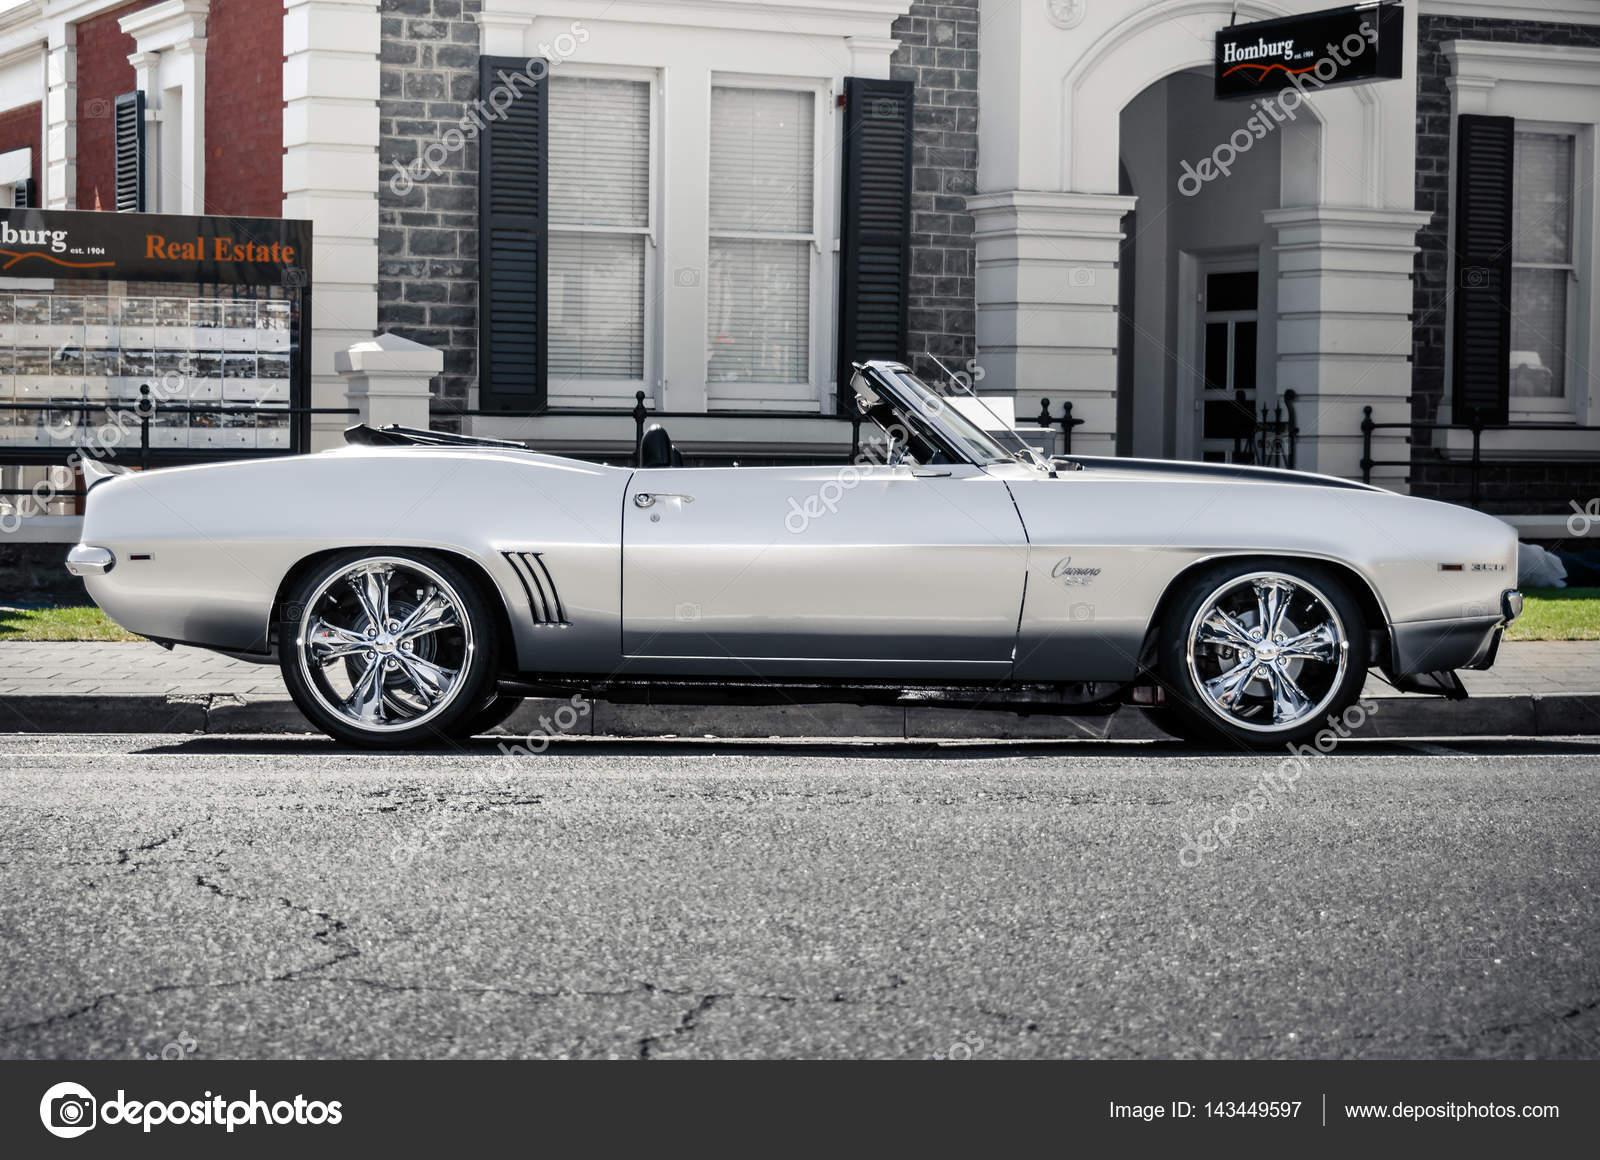 1968 Chevrolet Camaro Ss 350 Convertible Redaktionelles Stockfoto